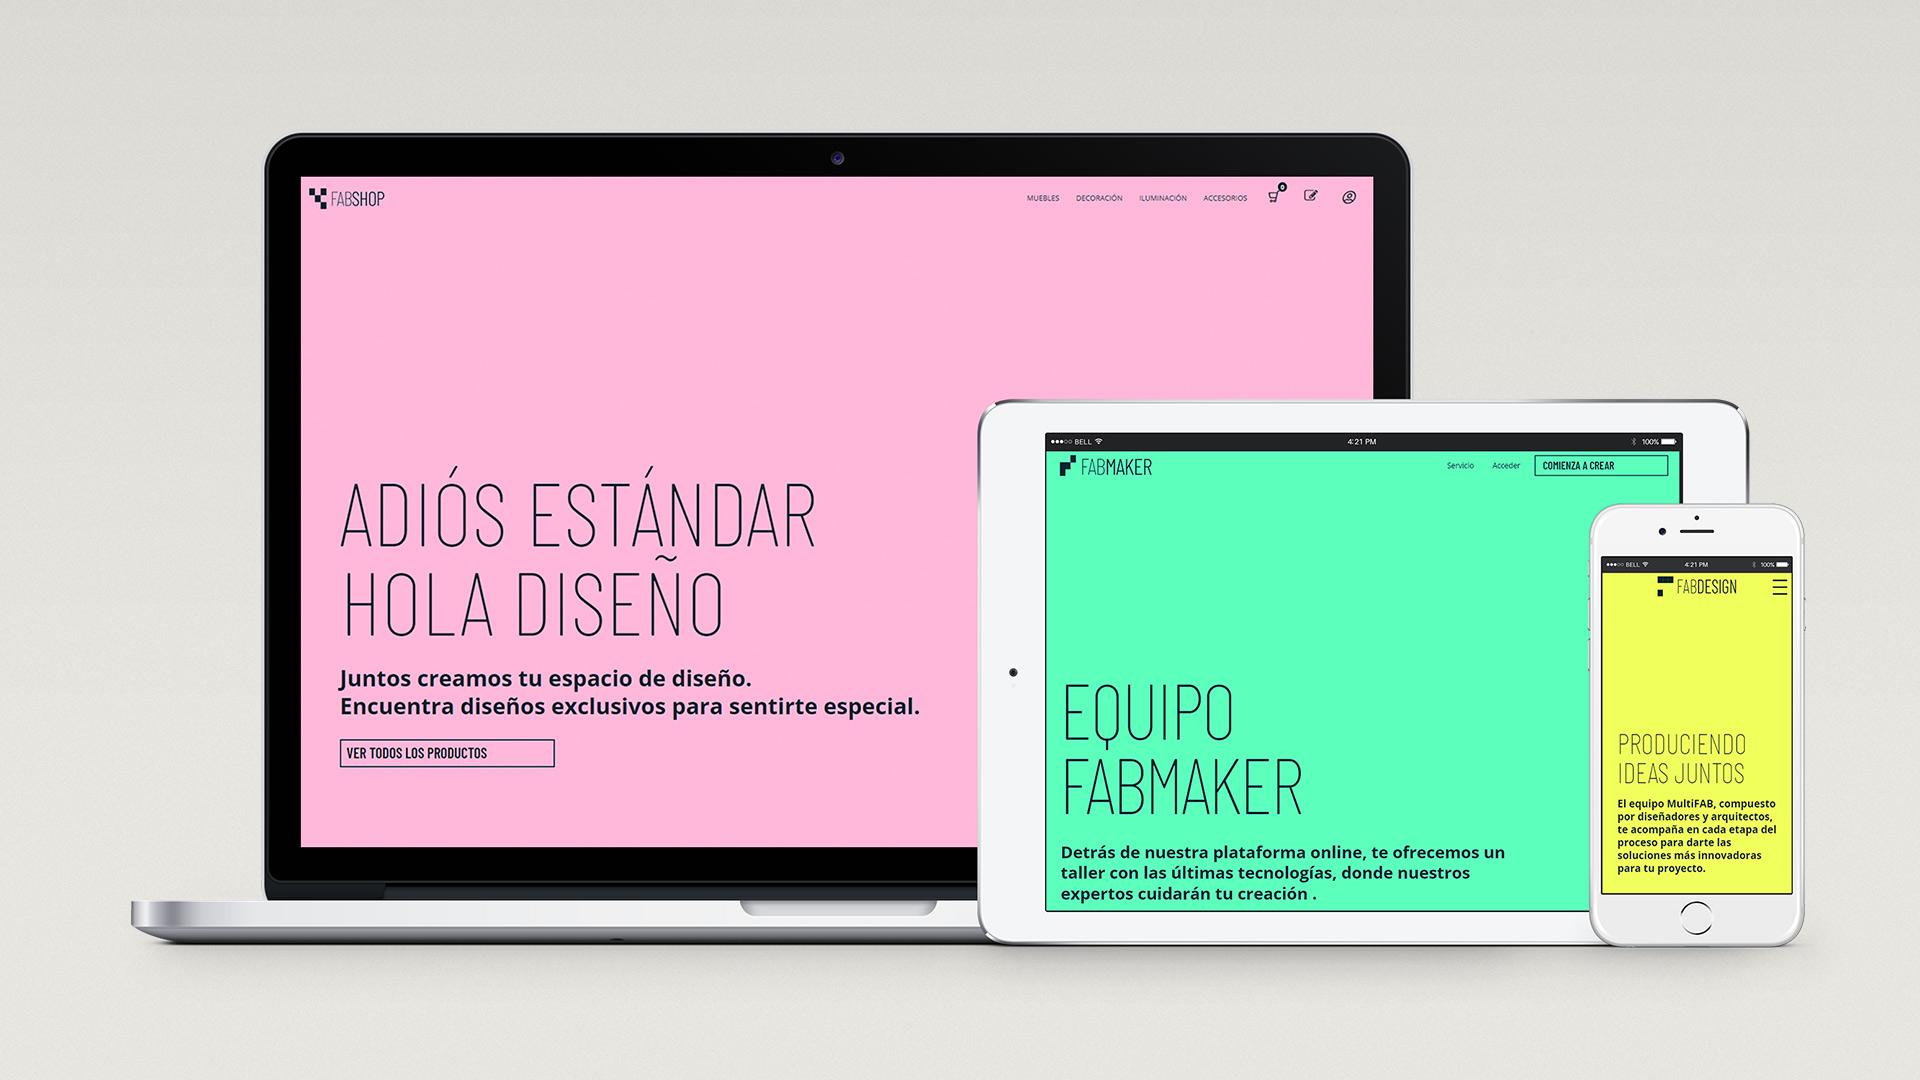 Interface design for mobile application for Fabmaker